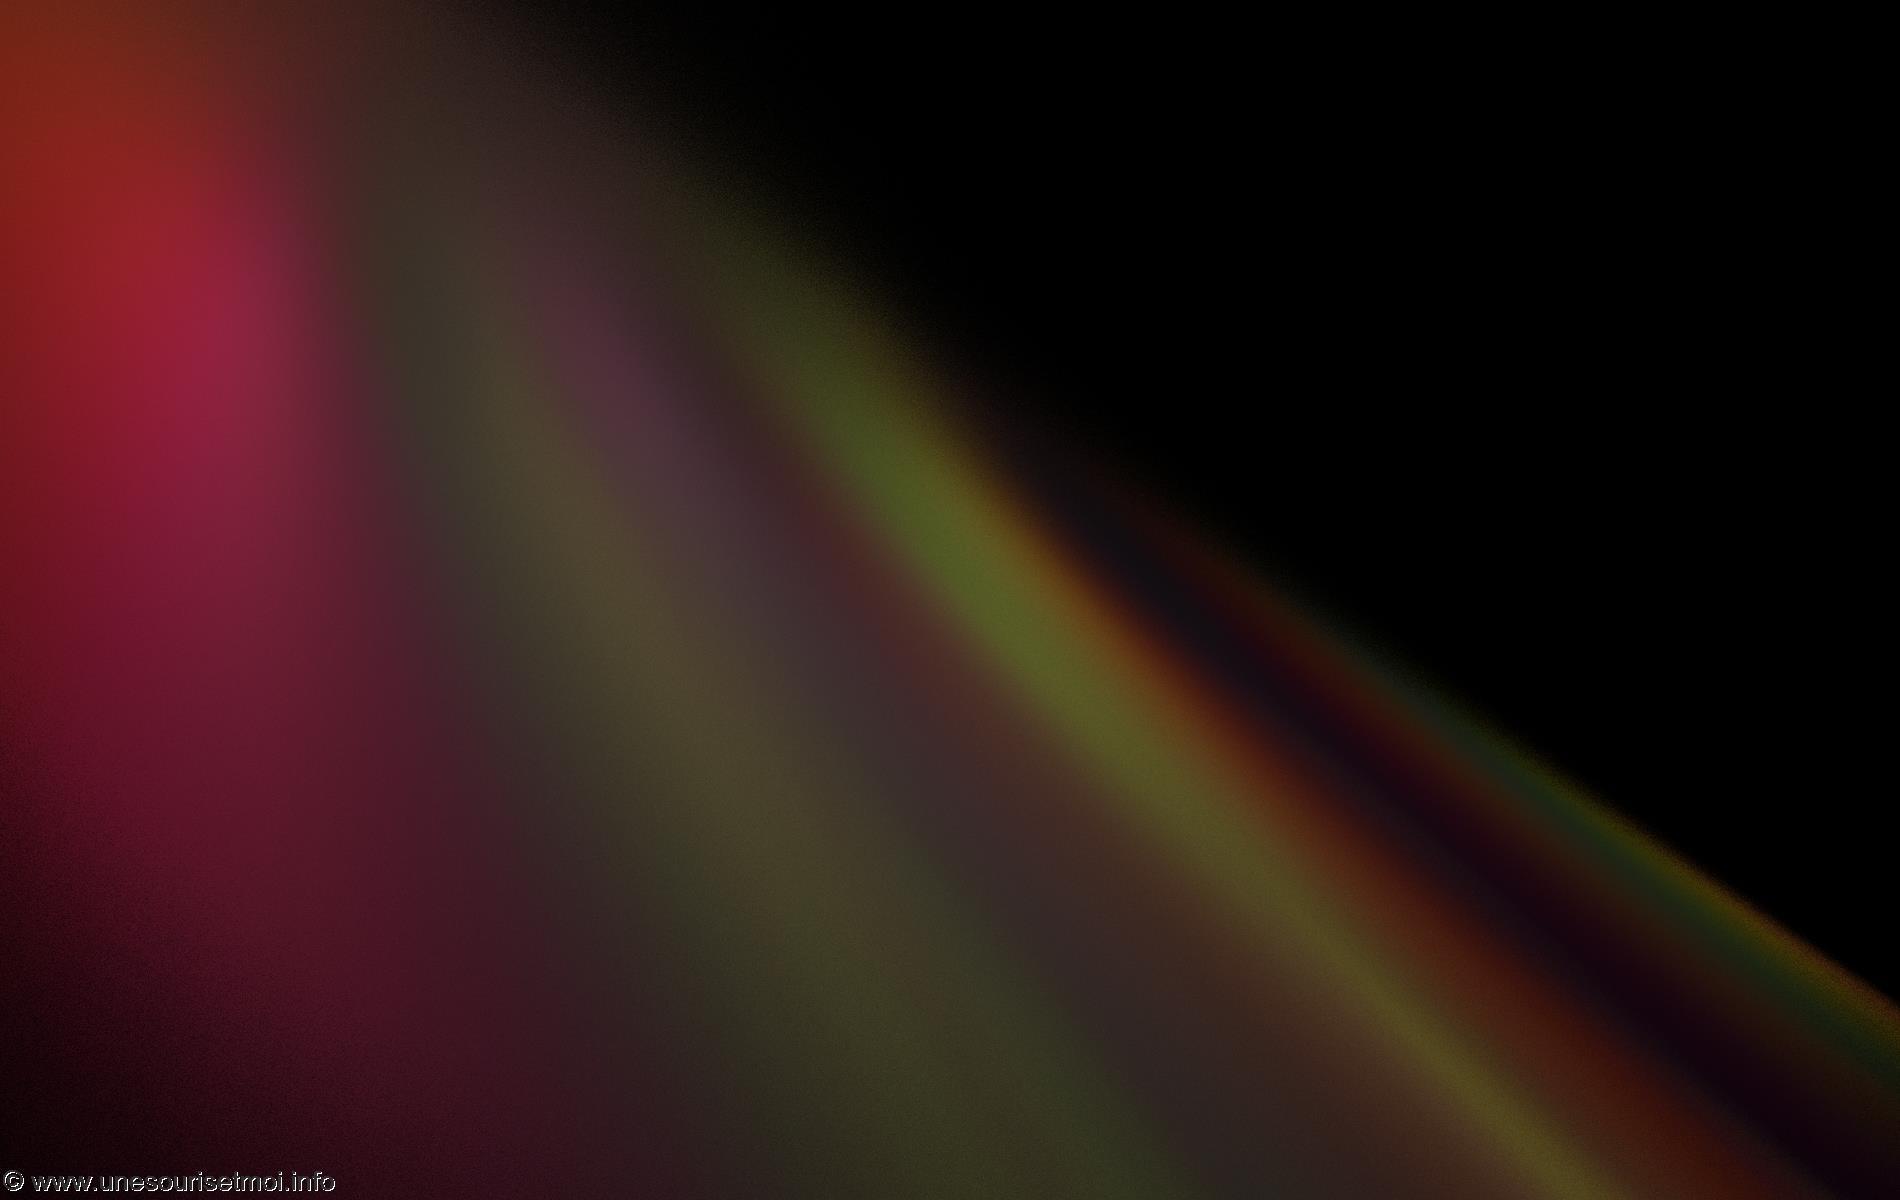 fonds-ecran-apophysis-creation-2D_2